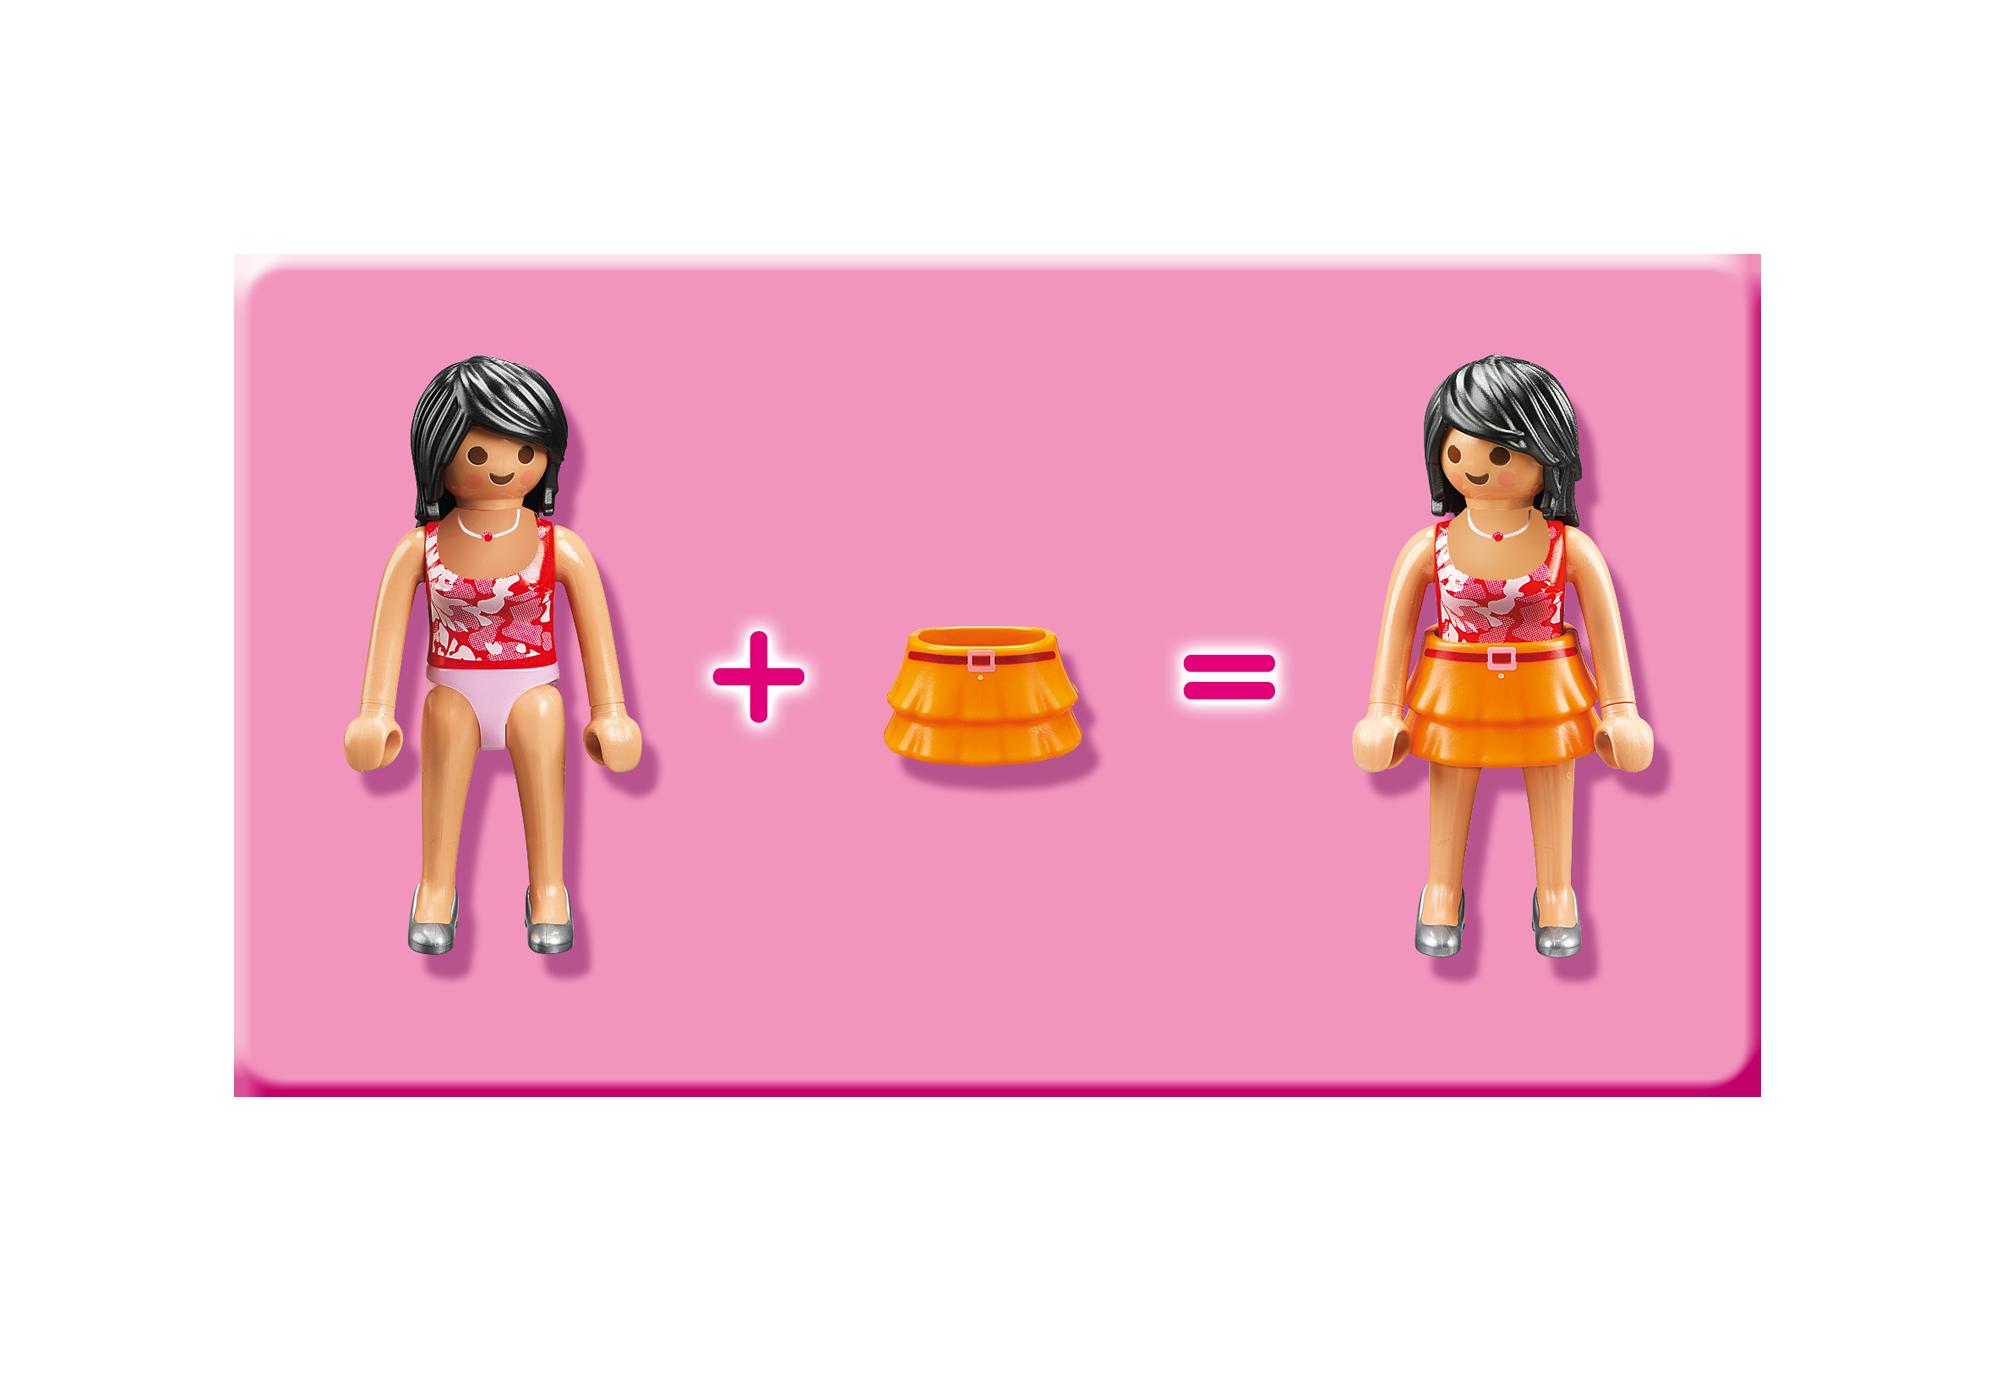 Good Http://media.playmobil.com/i/playmobil/5303_product_extra3